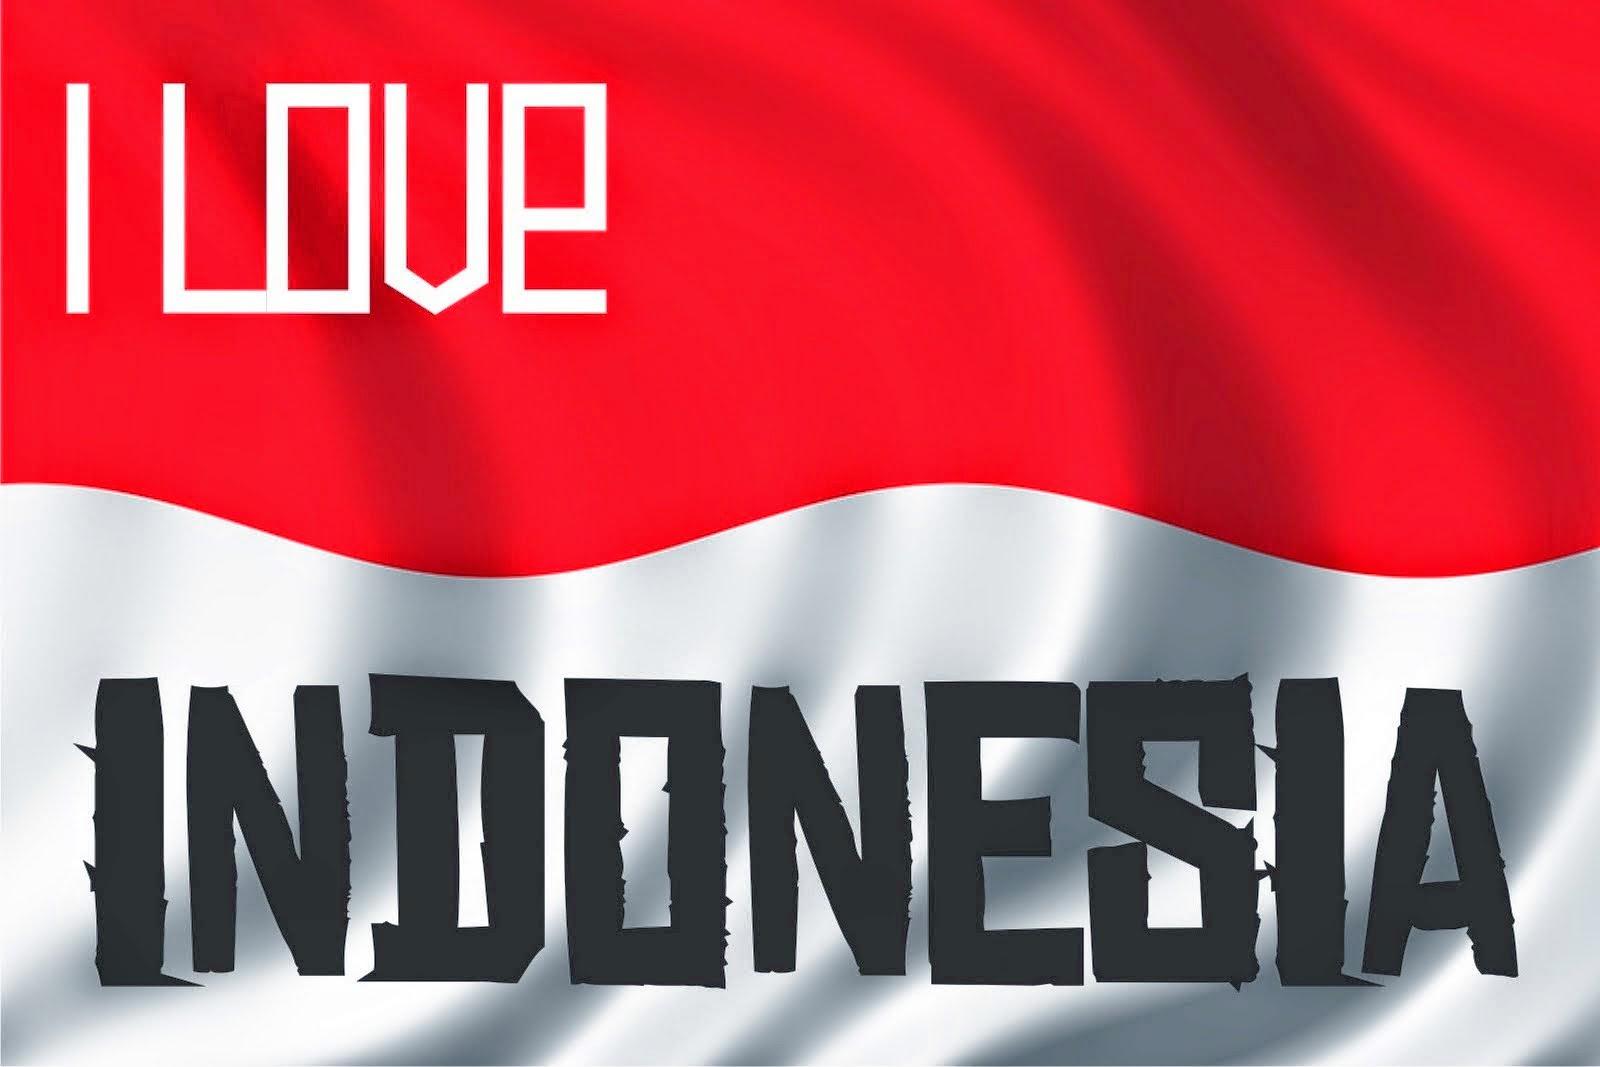 Ssh Indonesia 2 sampai 3 Agustus 2014